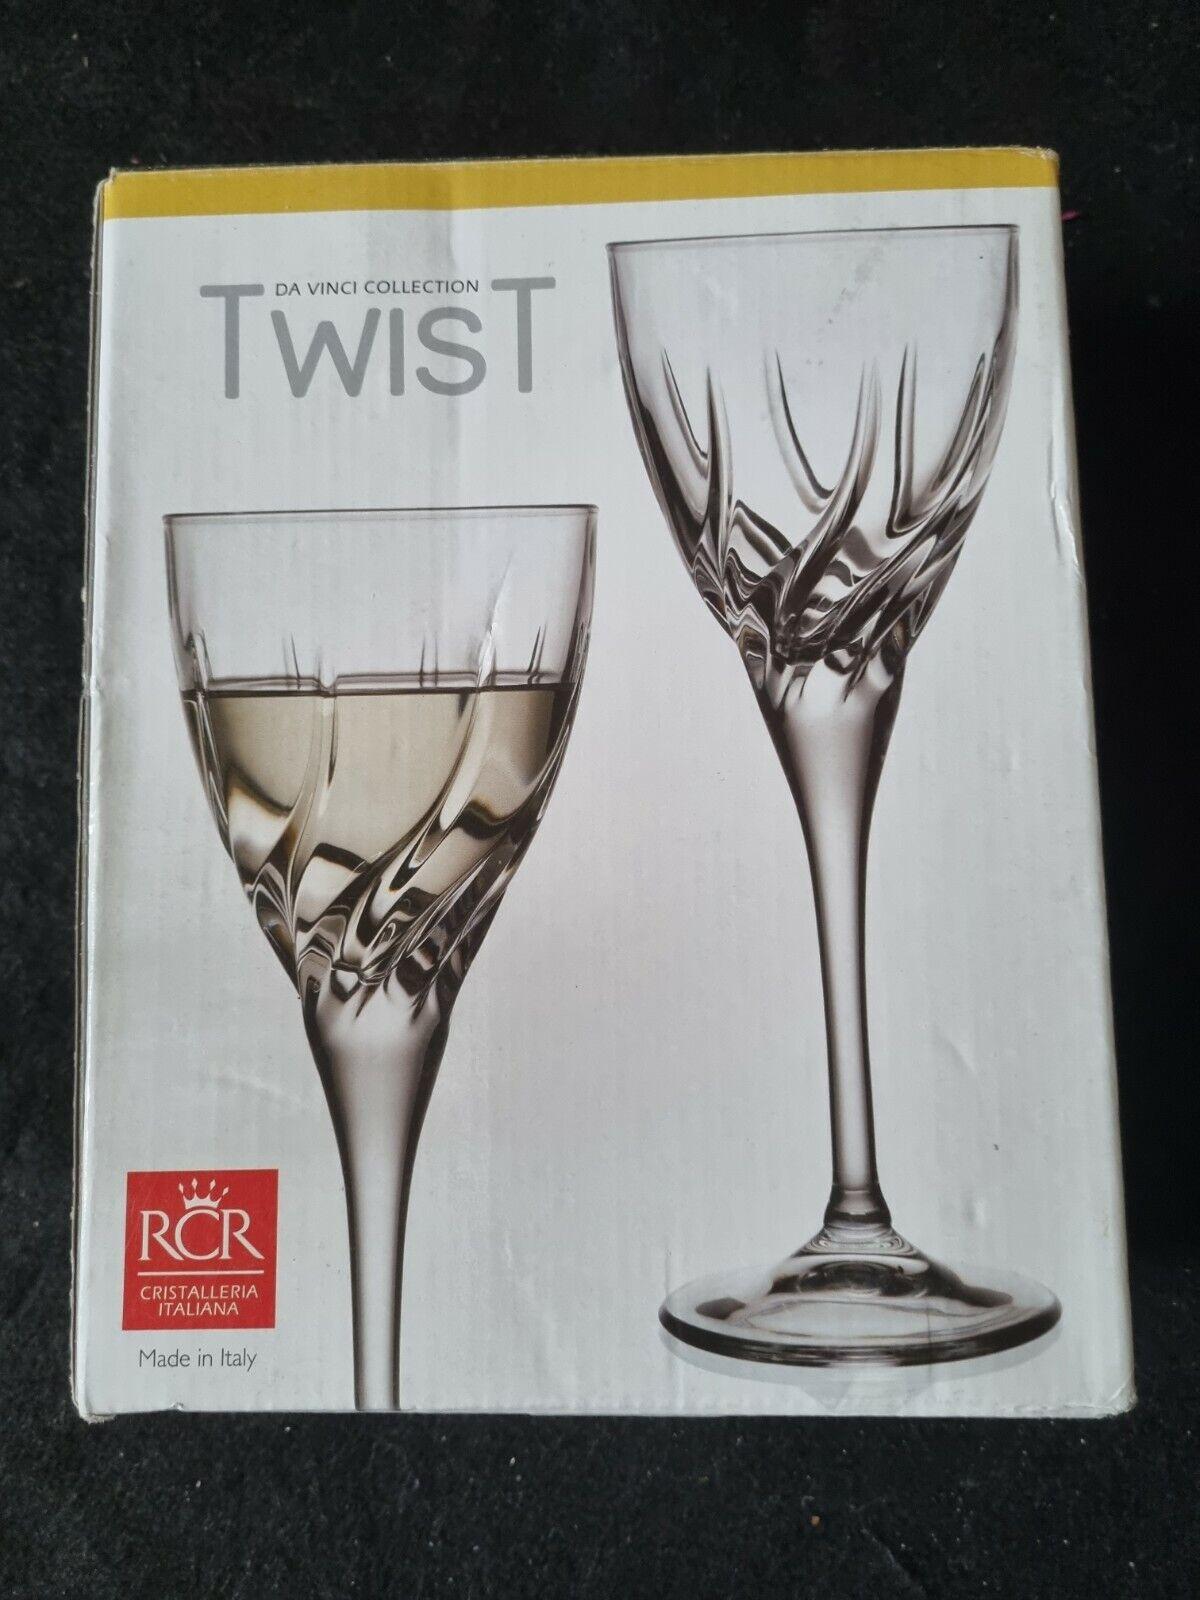 RCR Crystal Da Vinci Collection Twist Crystal White Wine Glasses x 2